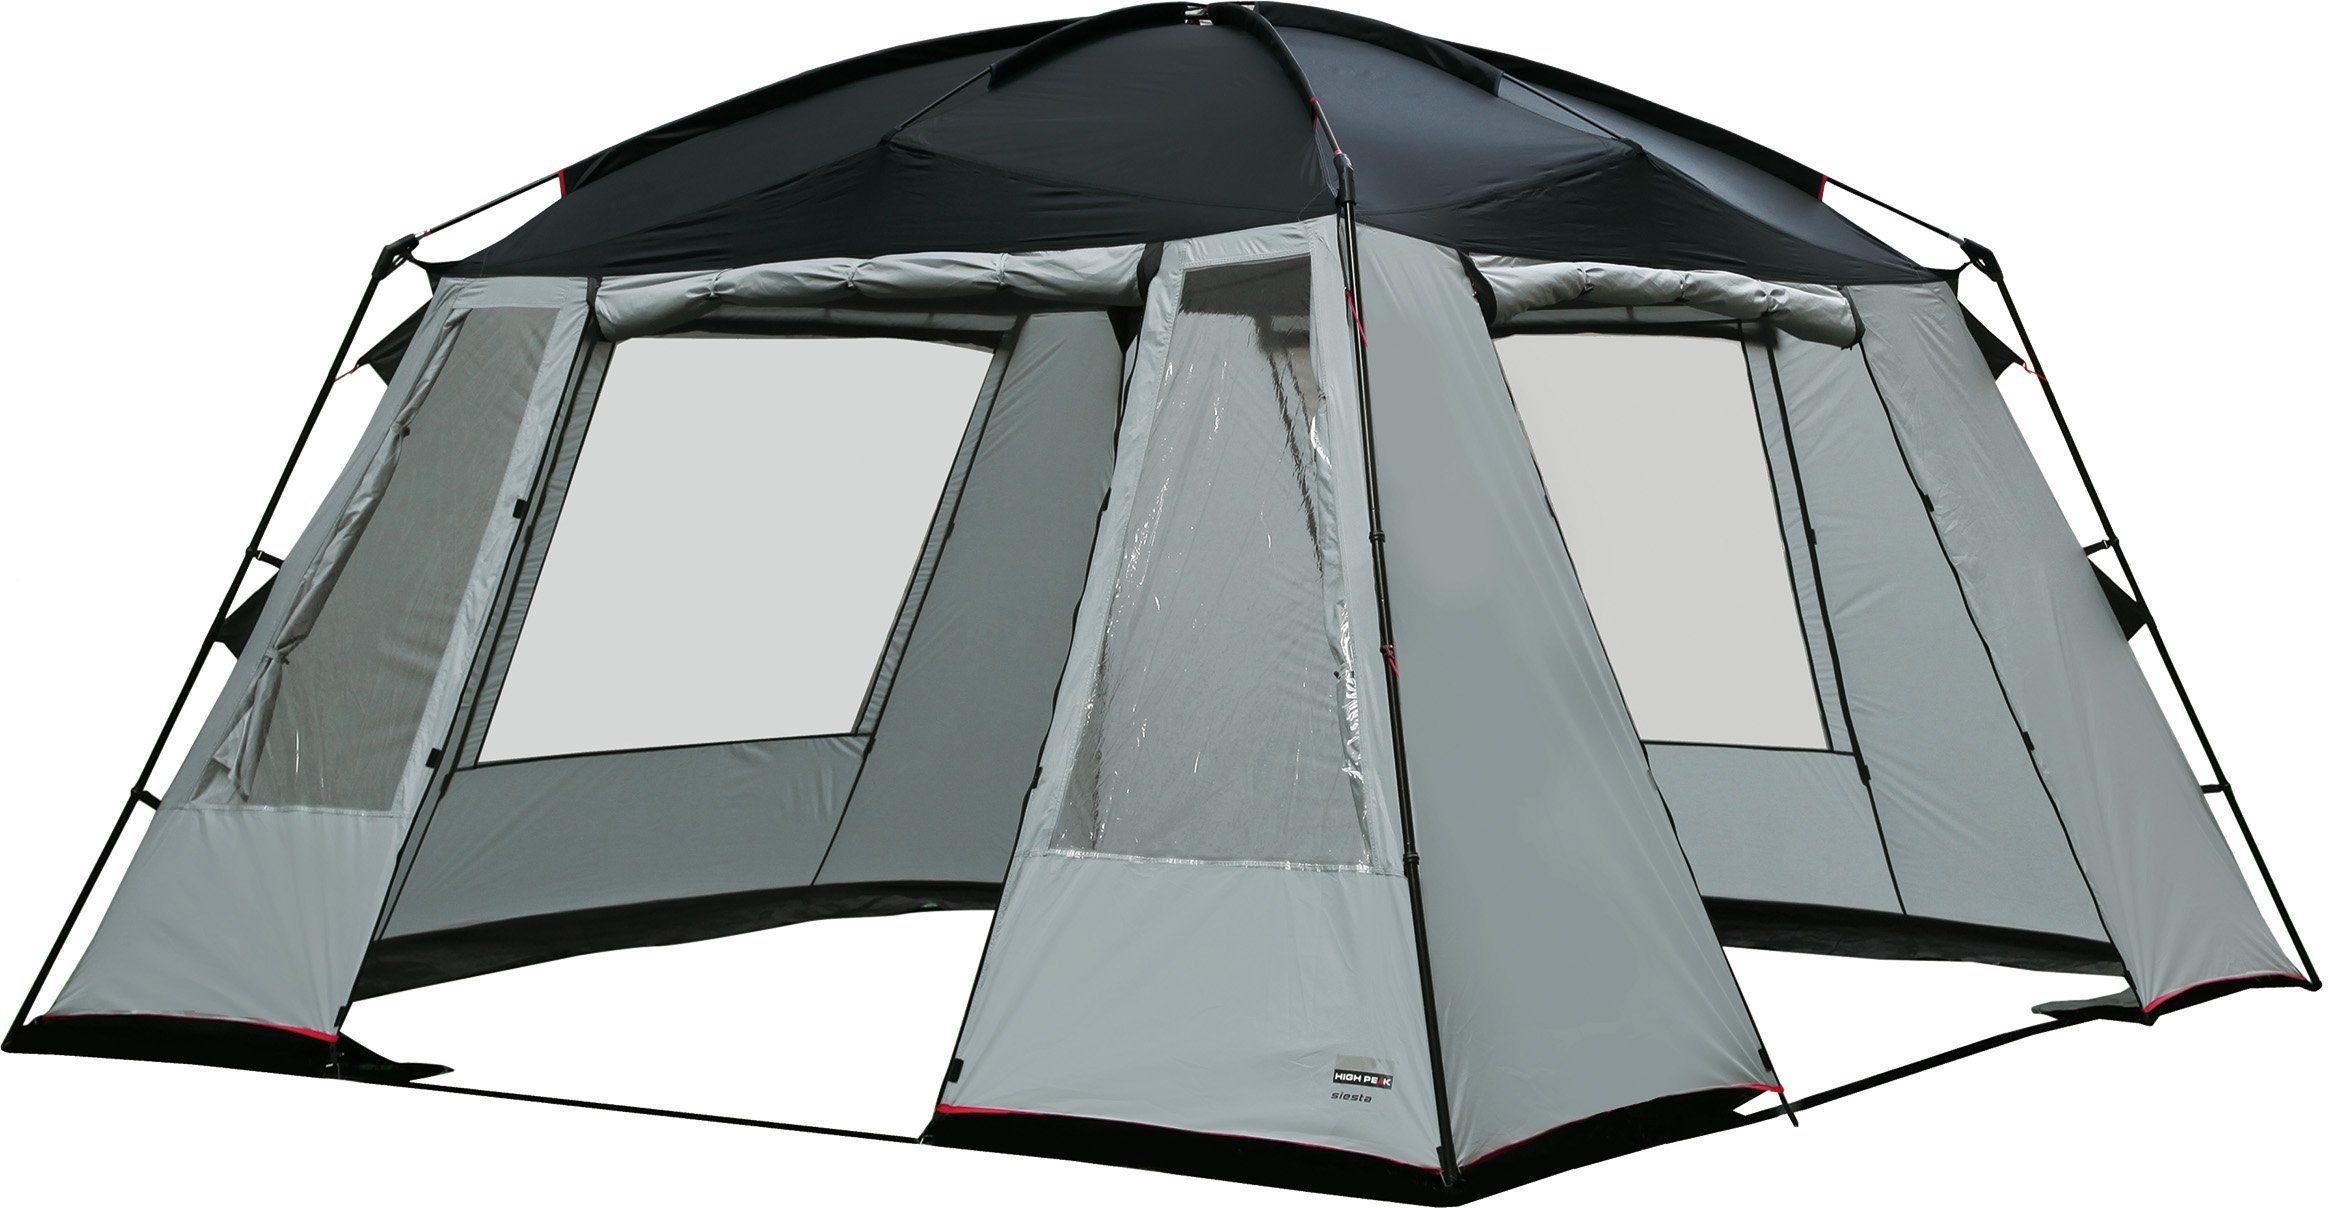 pavillon camping sturmfest pavillon ebay kleinanzeigen. Black Bedroom Furniture Sets. Home Design Ideas